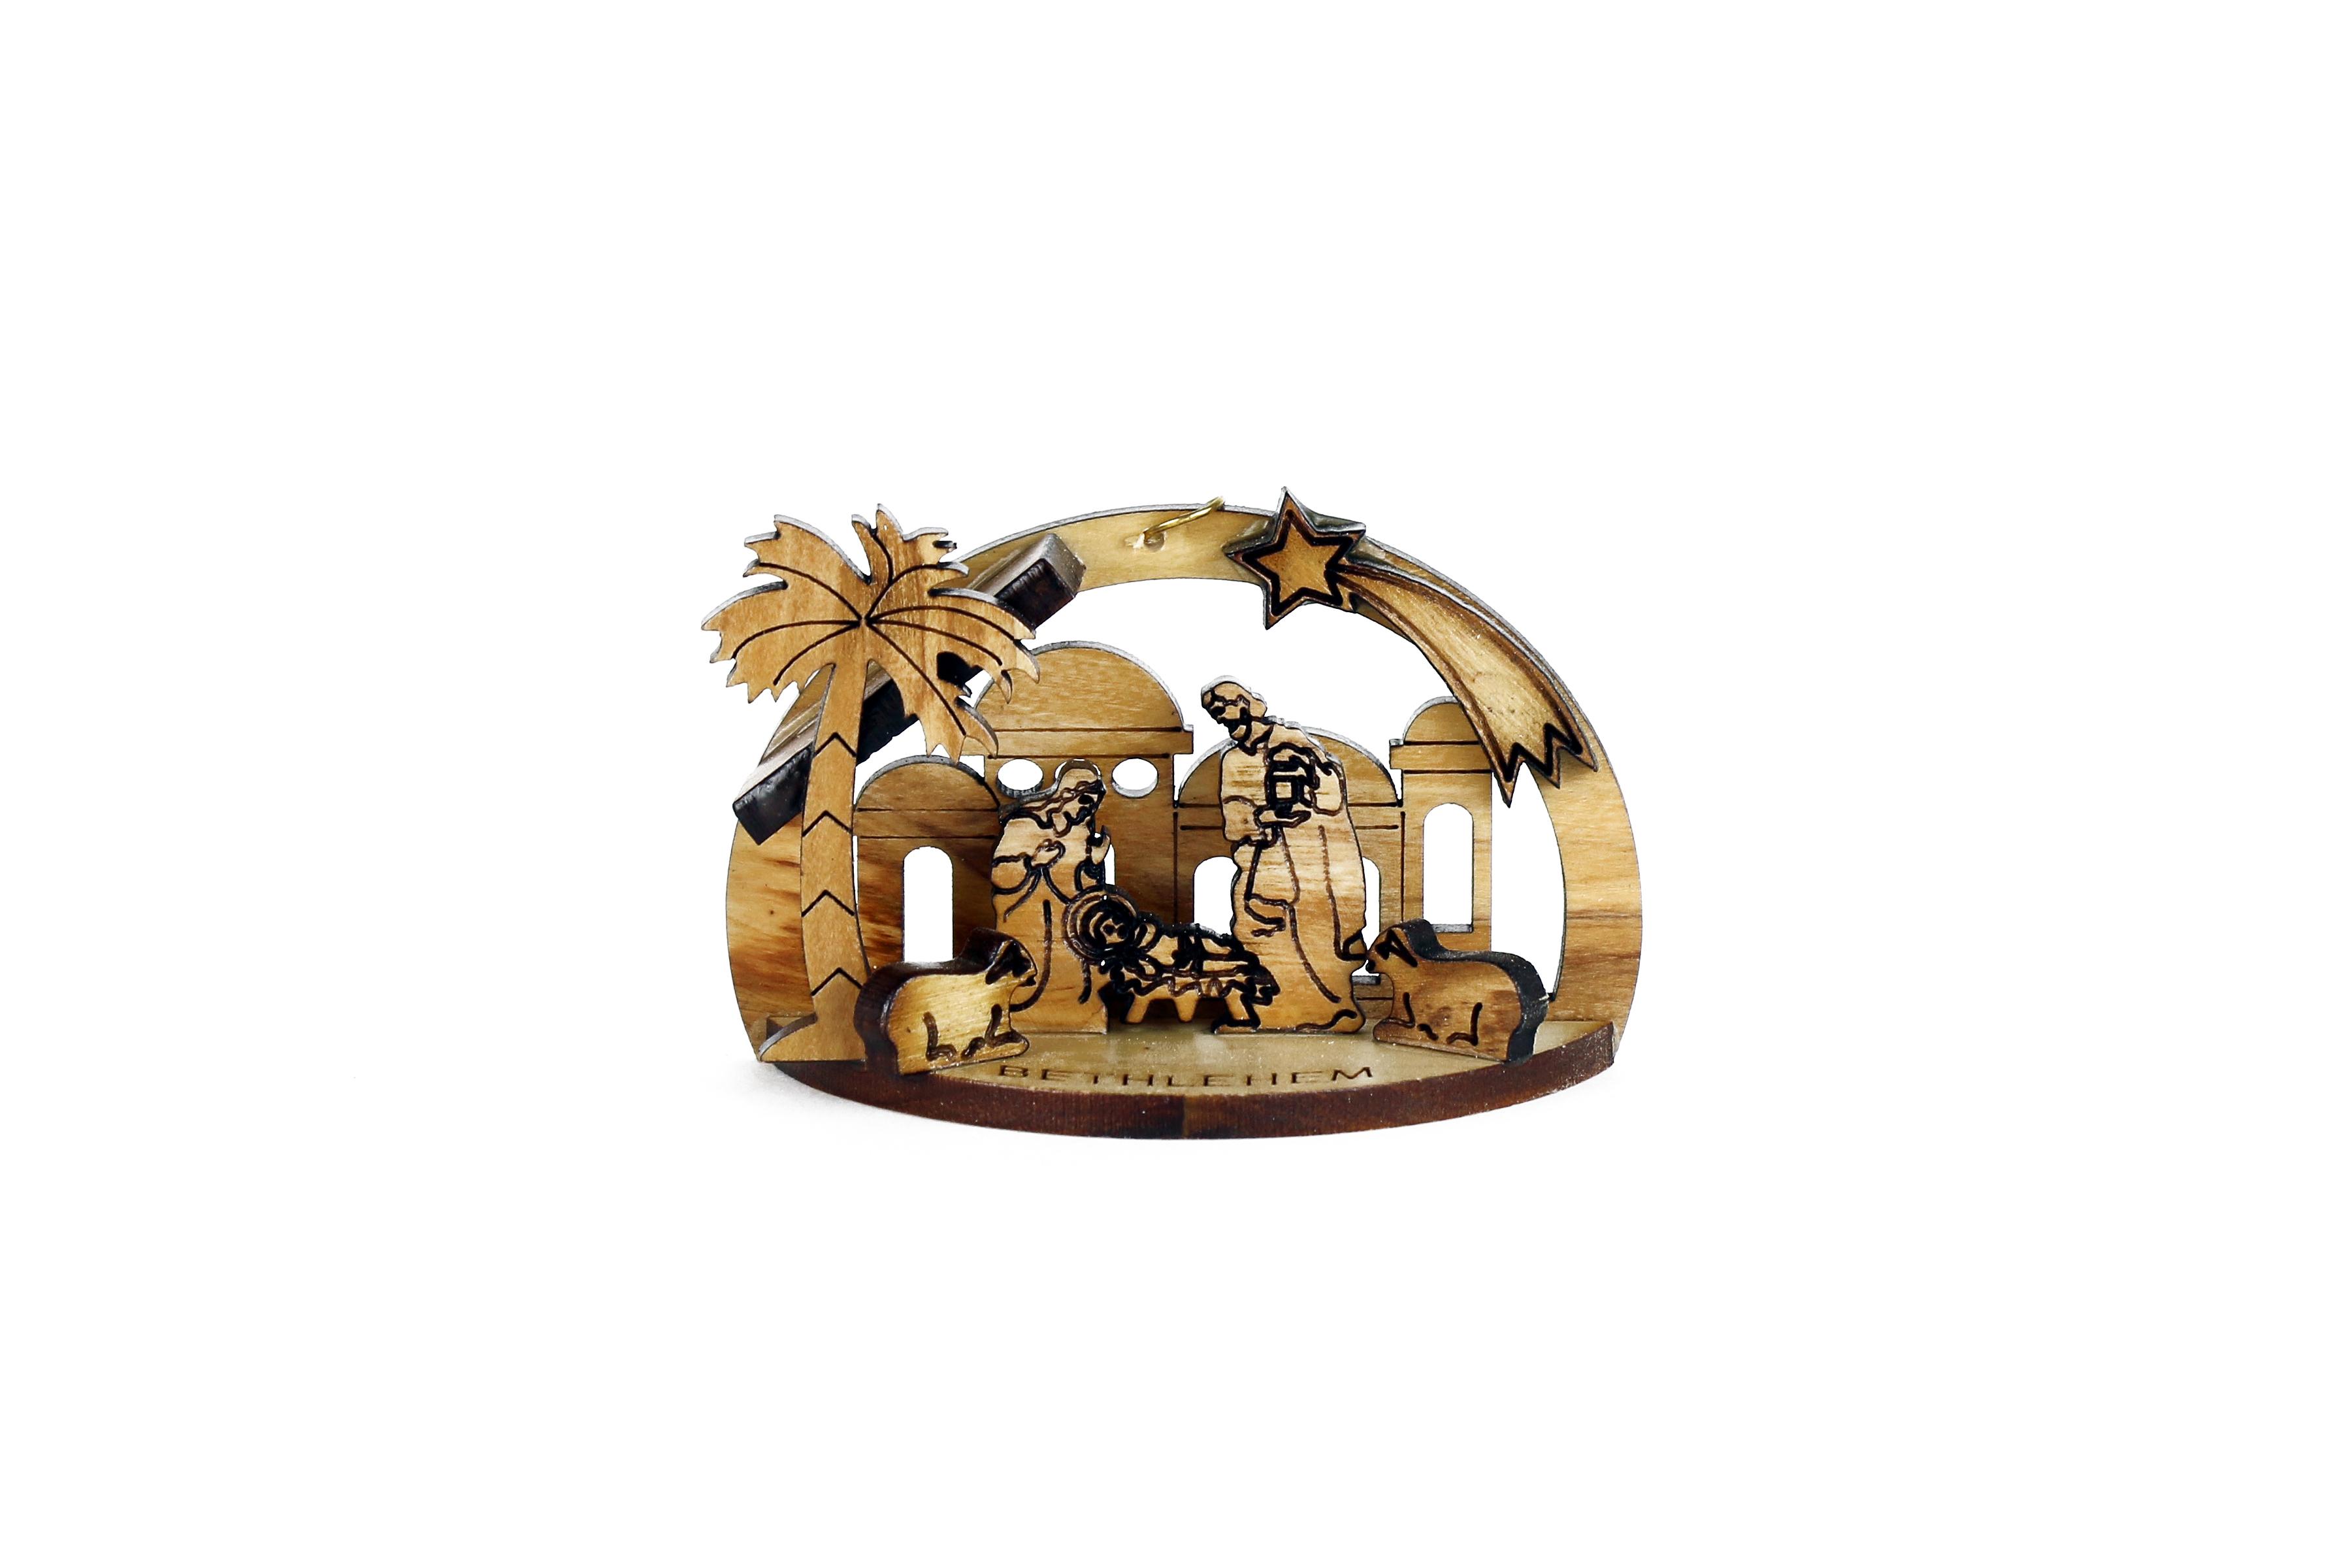 crèche / Nativity